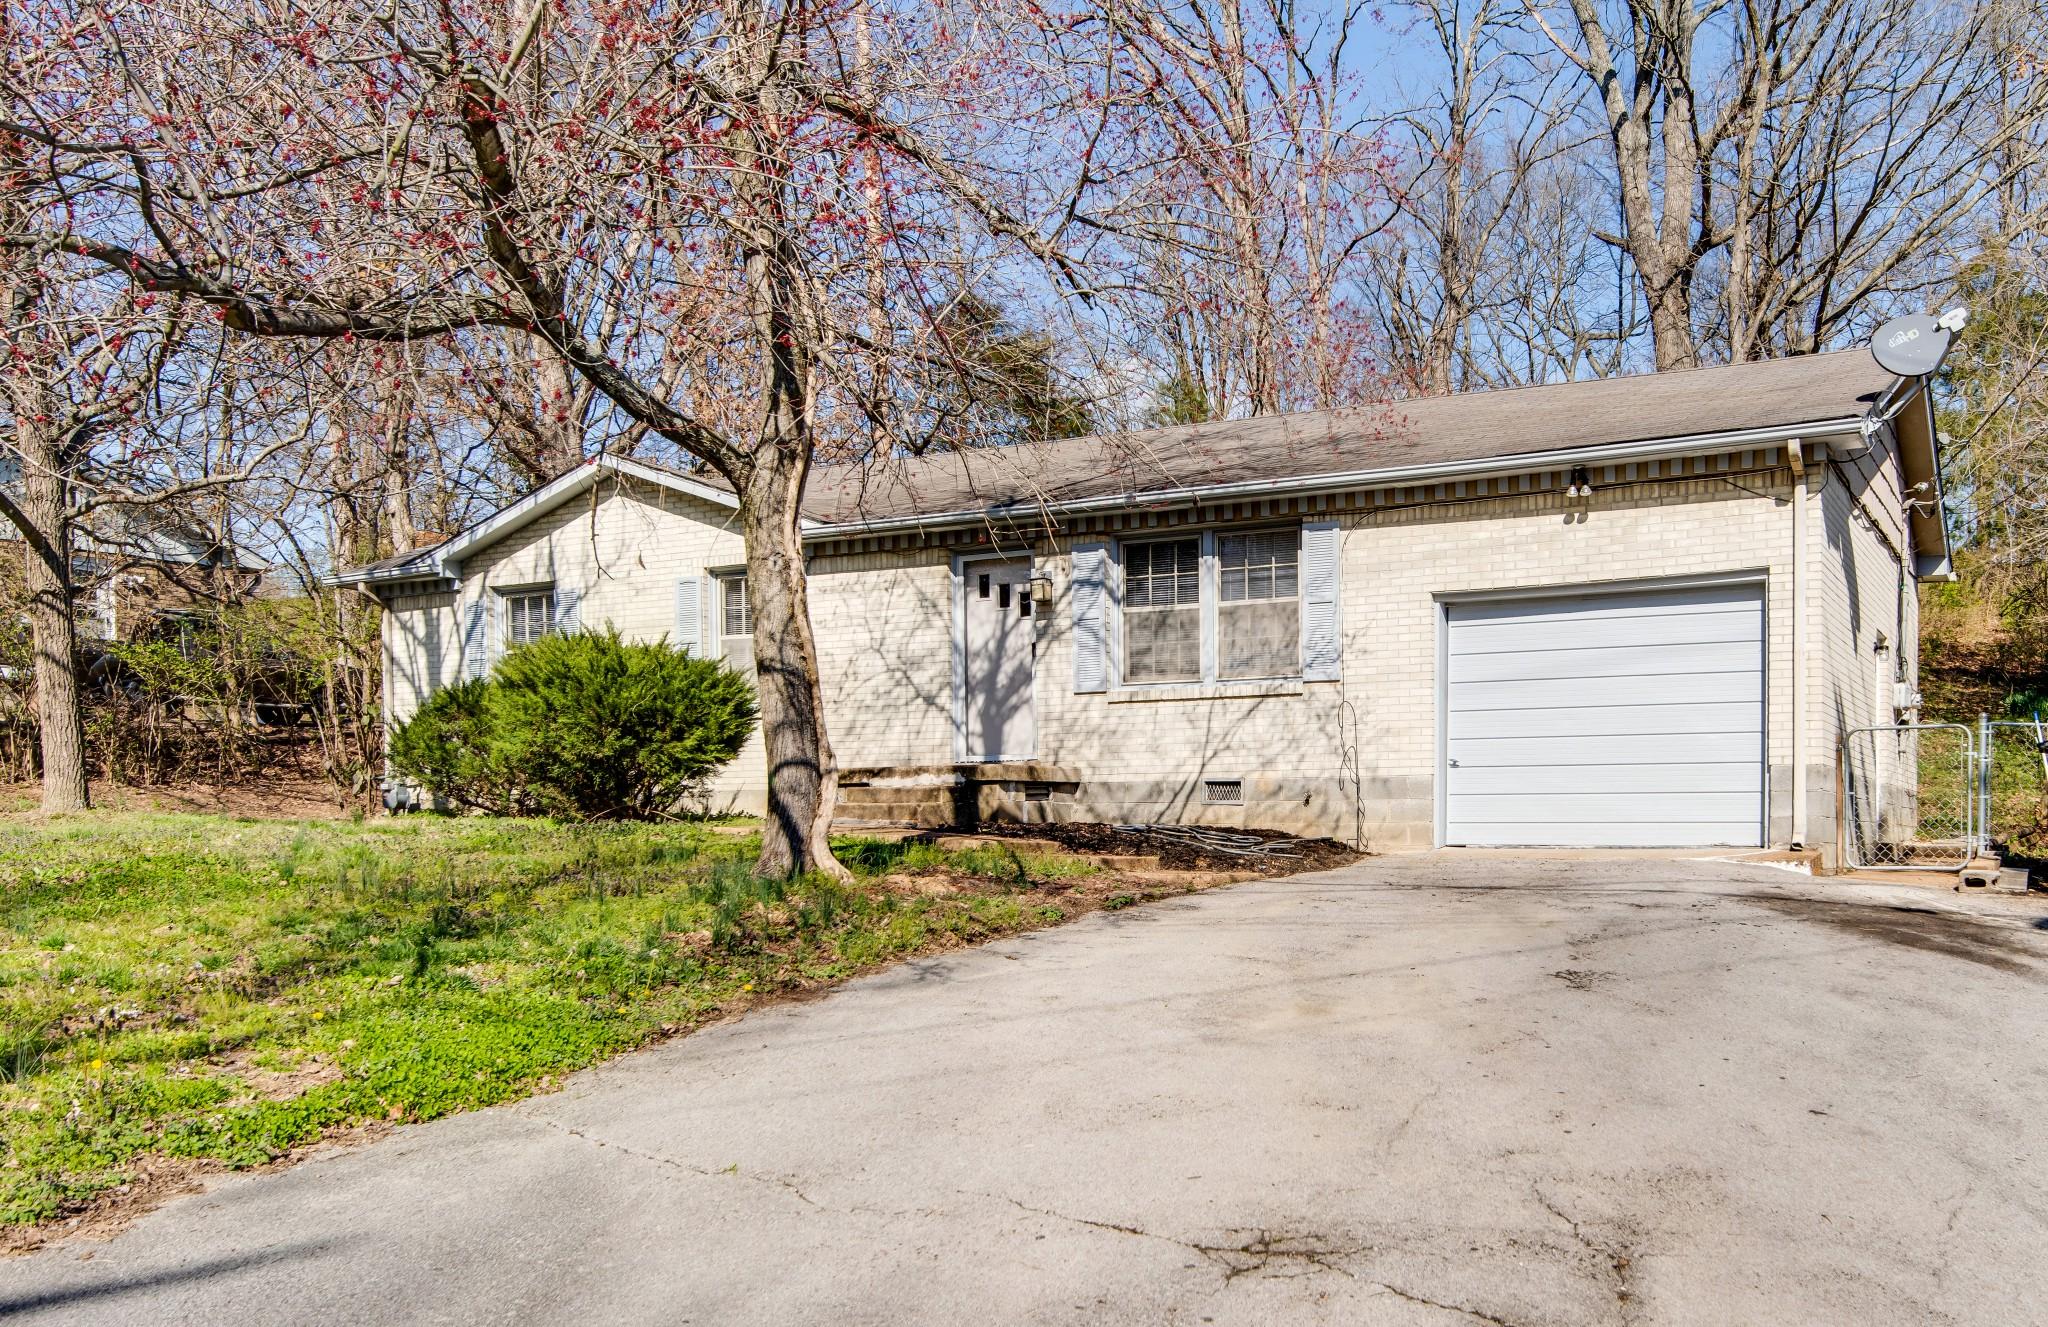 116 Penny Brink Drive, Antioch, TN 37013 - Antioch, TN real estate listing